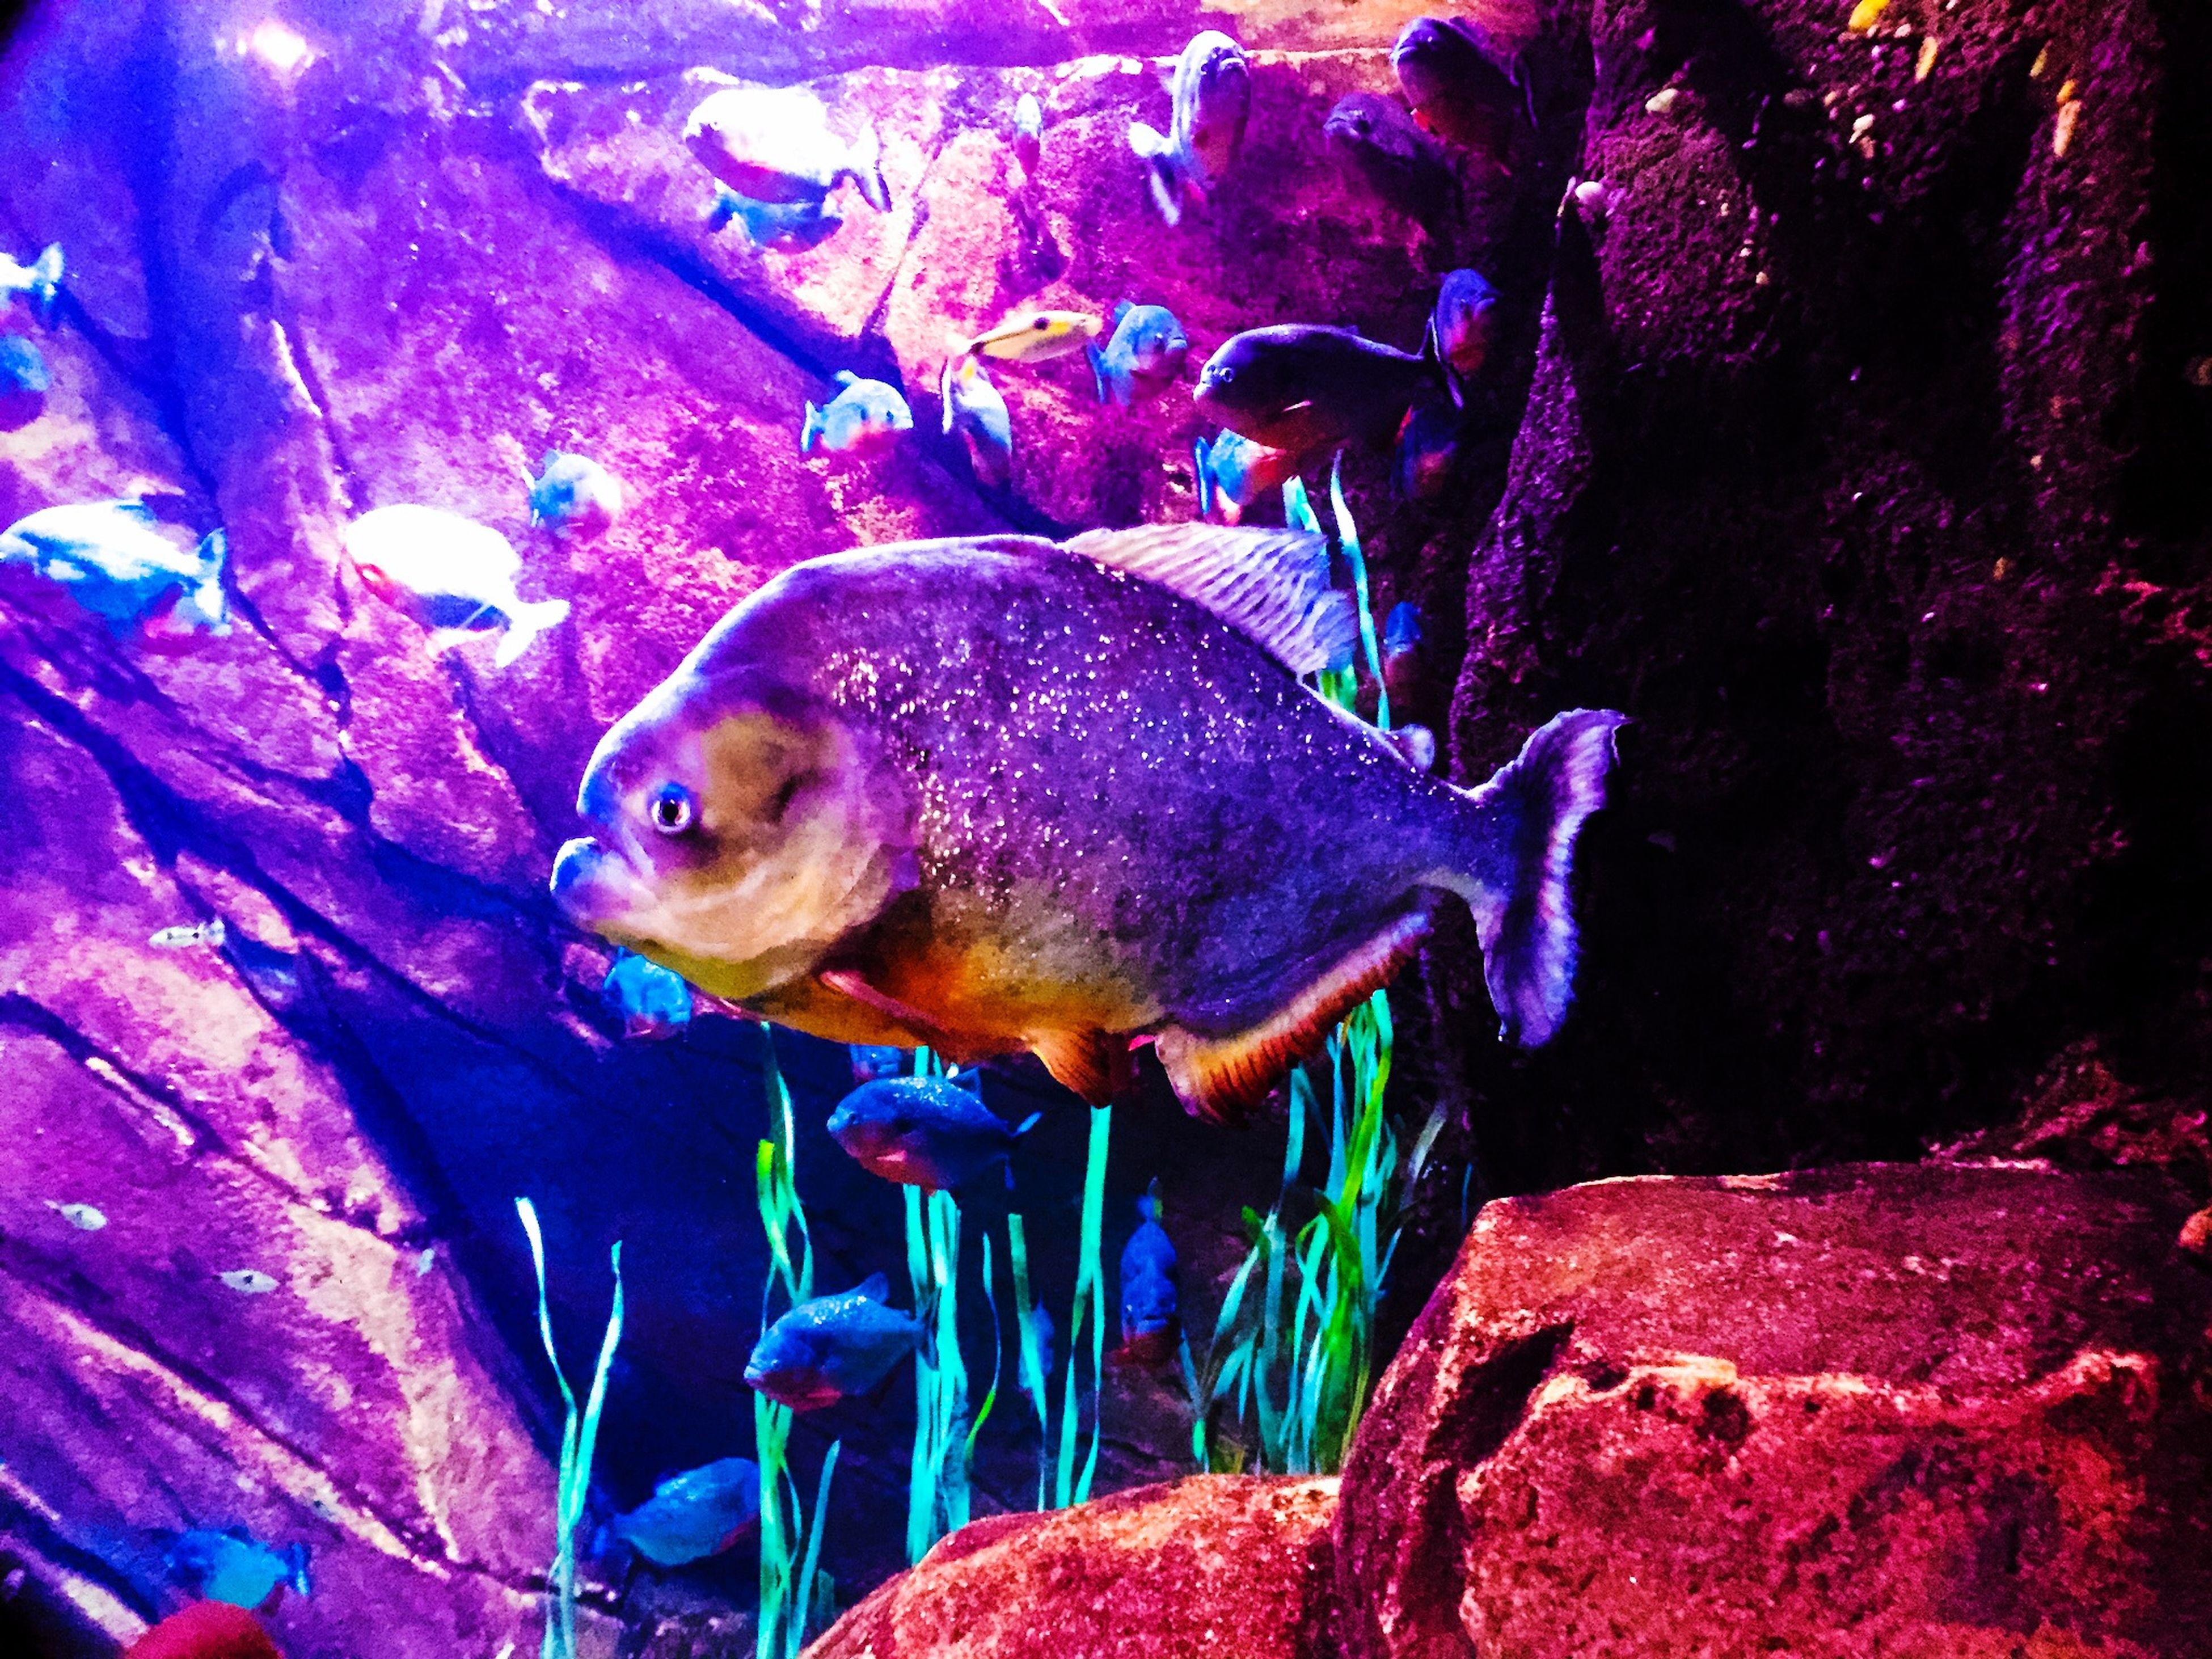 IPhoneography Iphone 6 IPad Edit Fish